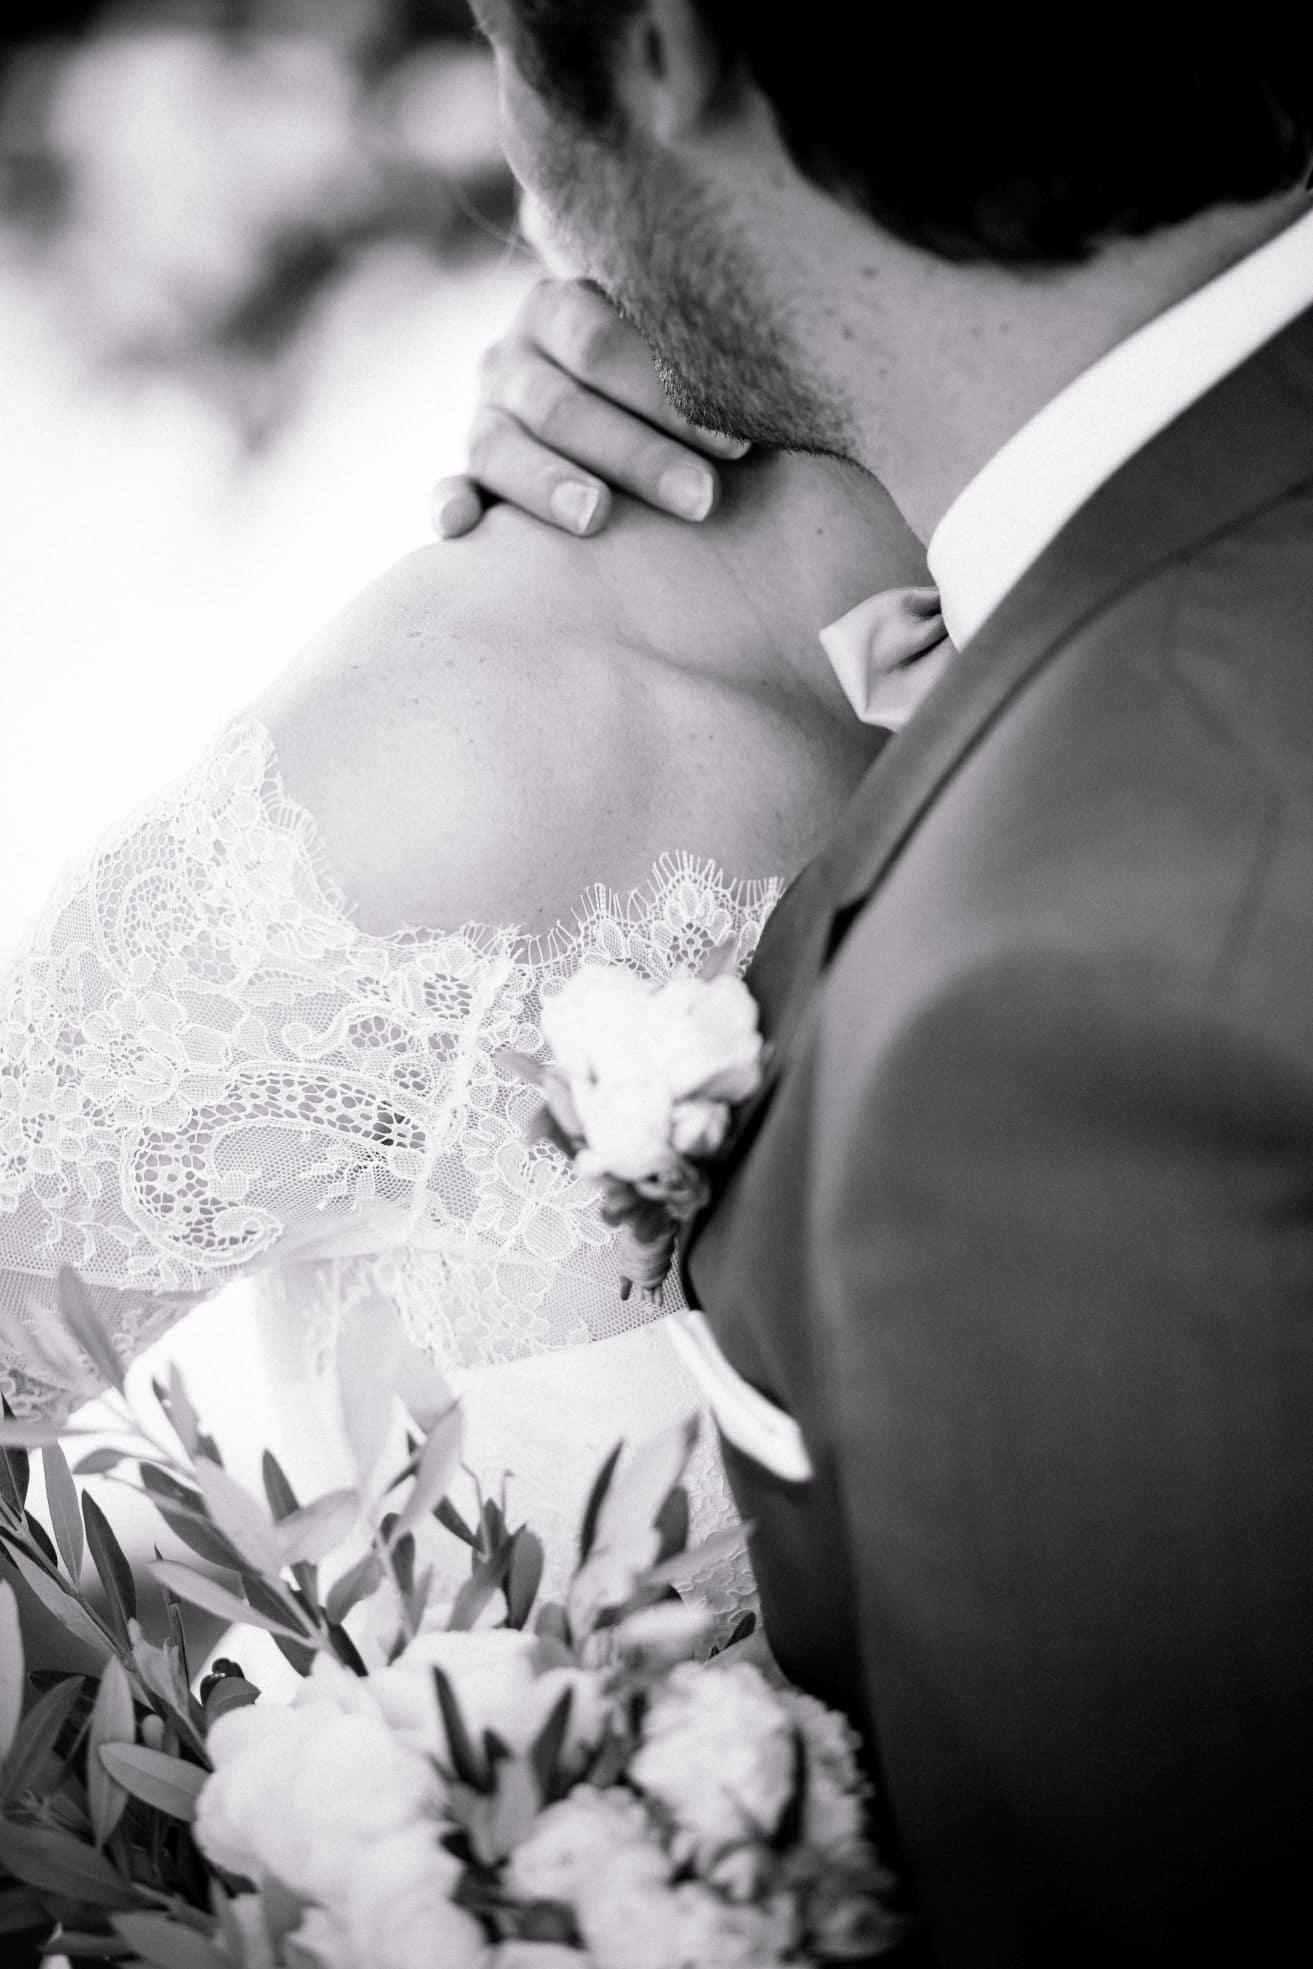 Million Memories_A&D_Hochzeitsfotograf_Schlosshochzeit_Toskana_Lago Di Como_Wedding_Tuscany_101